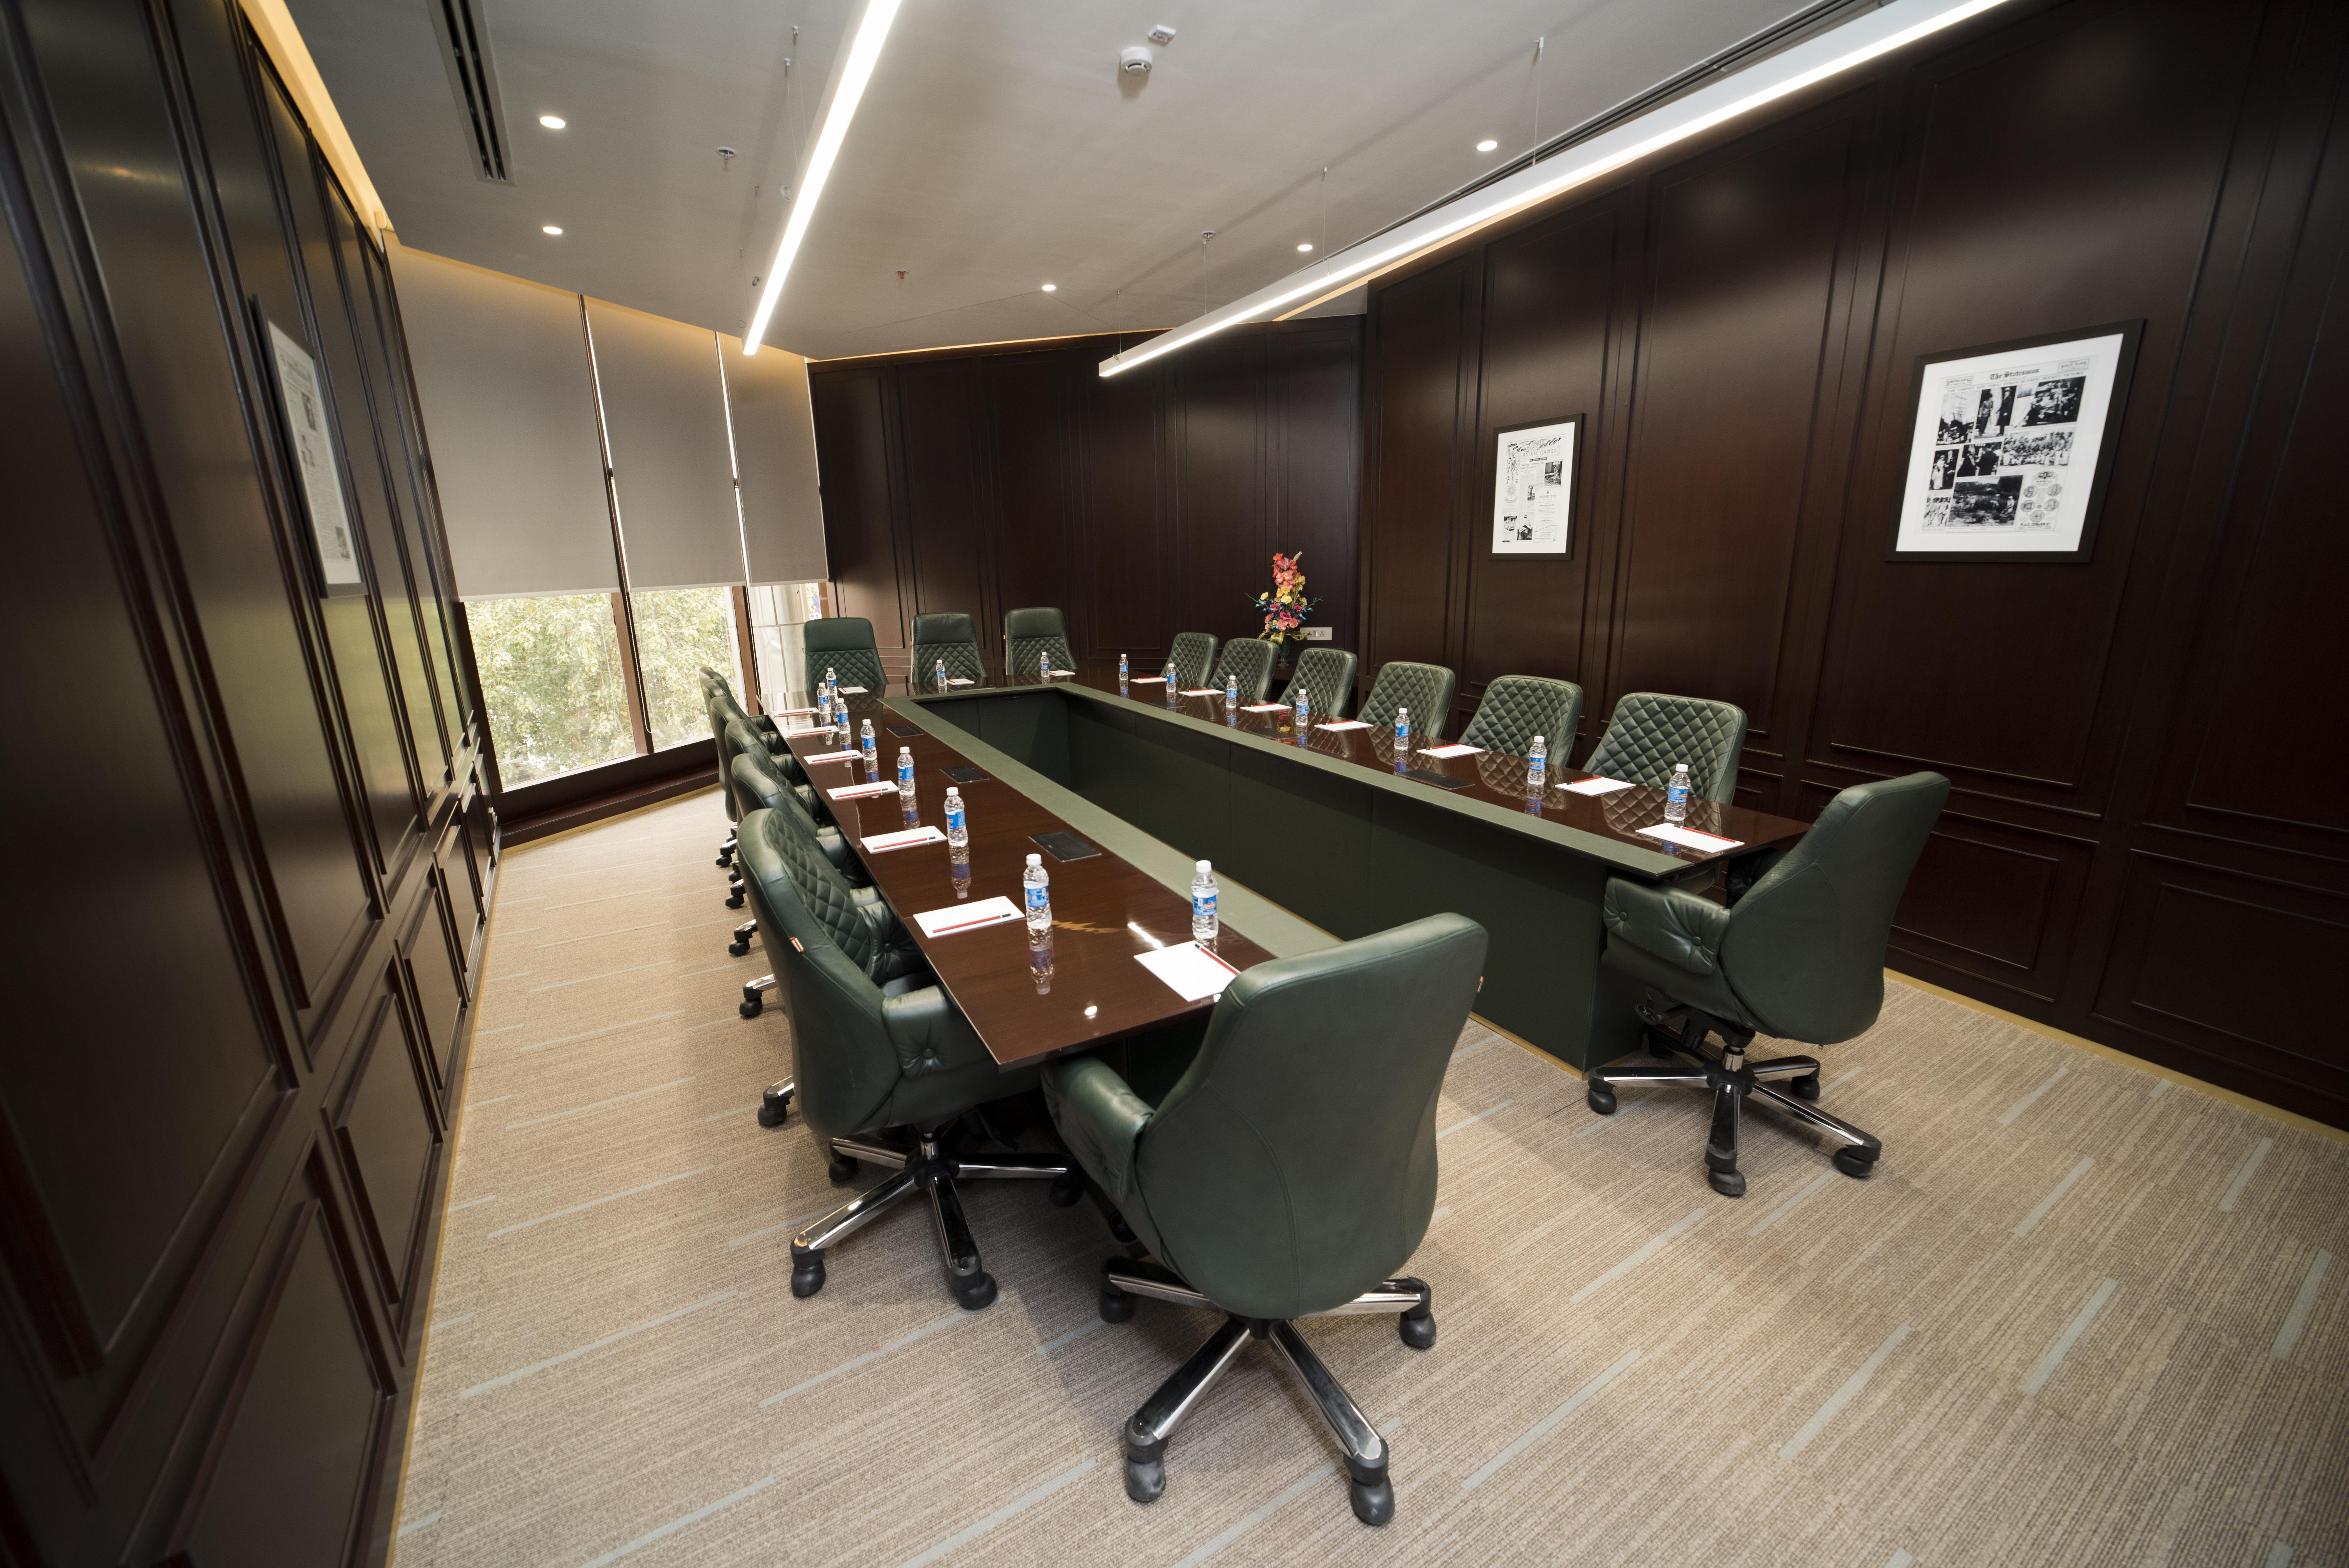 meeting rooms, Statesman Chambers Meeting Room, meeting rooms in Delhi